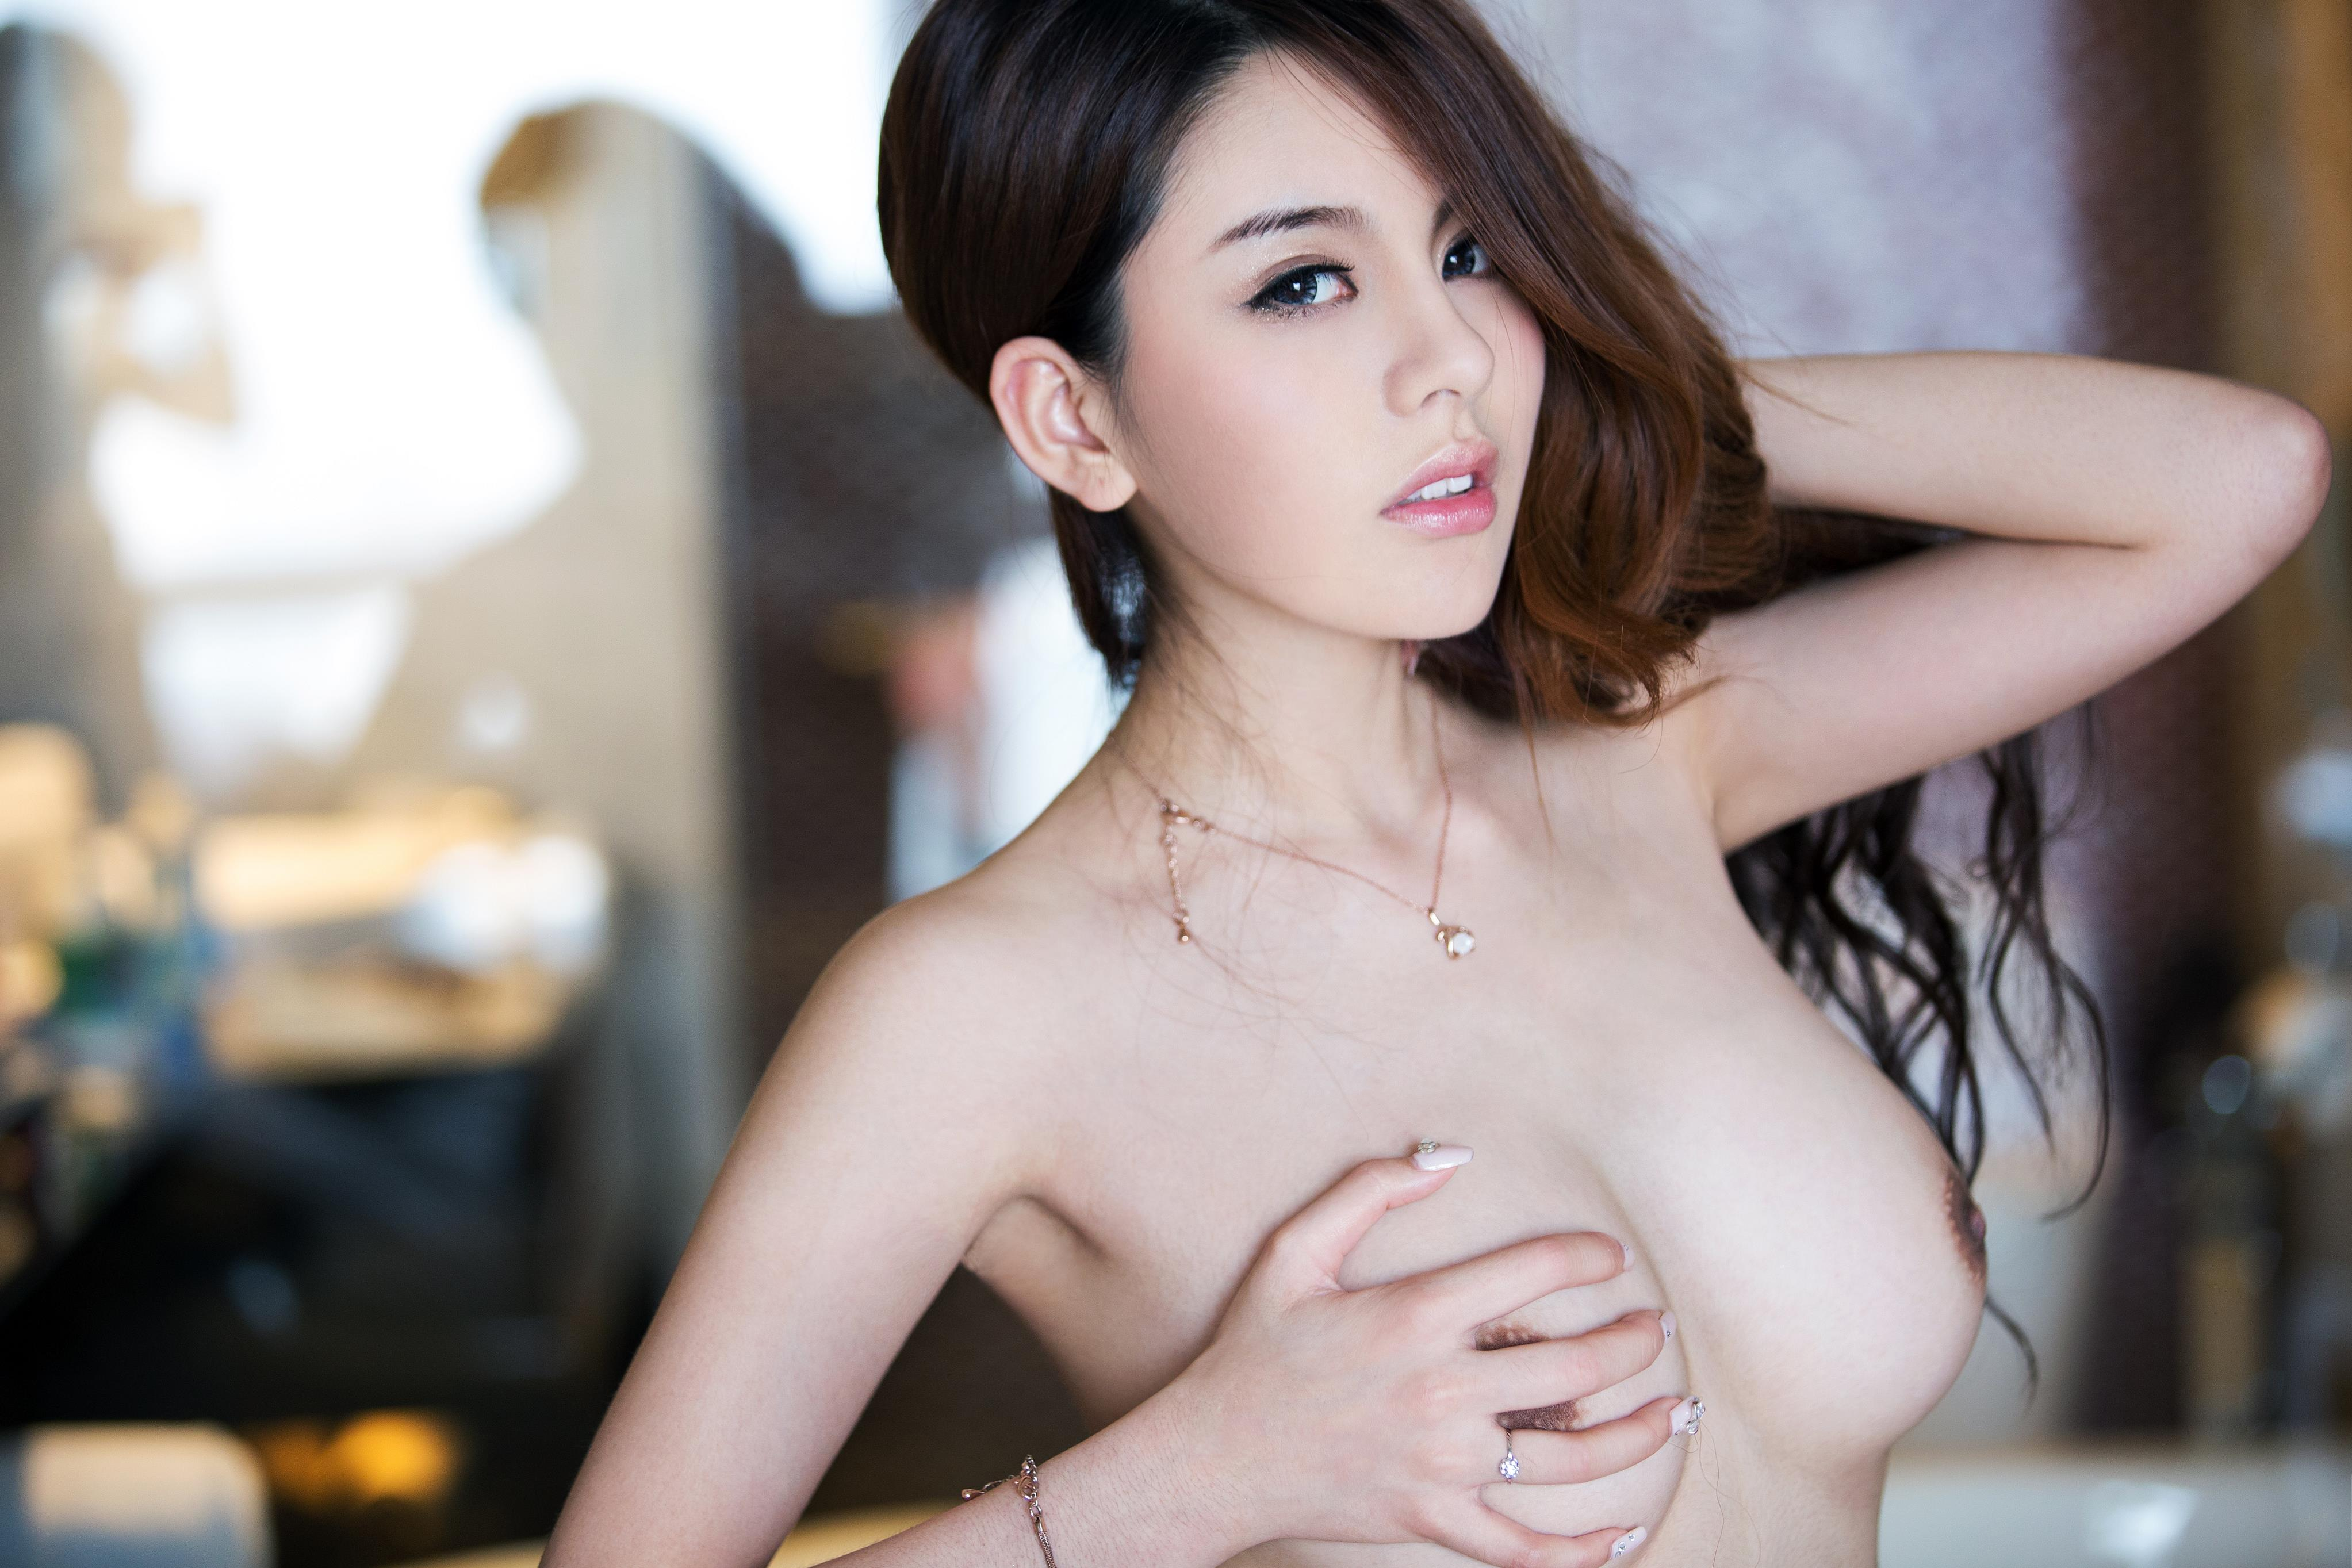 Model chaina topless — photo 5